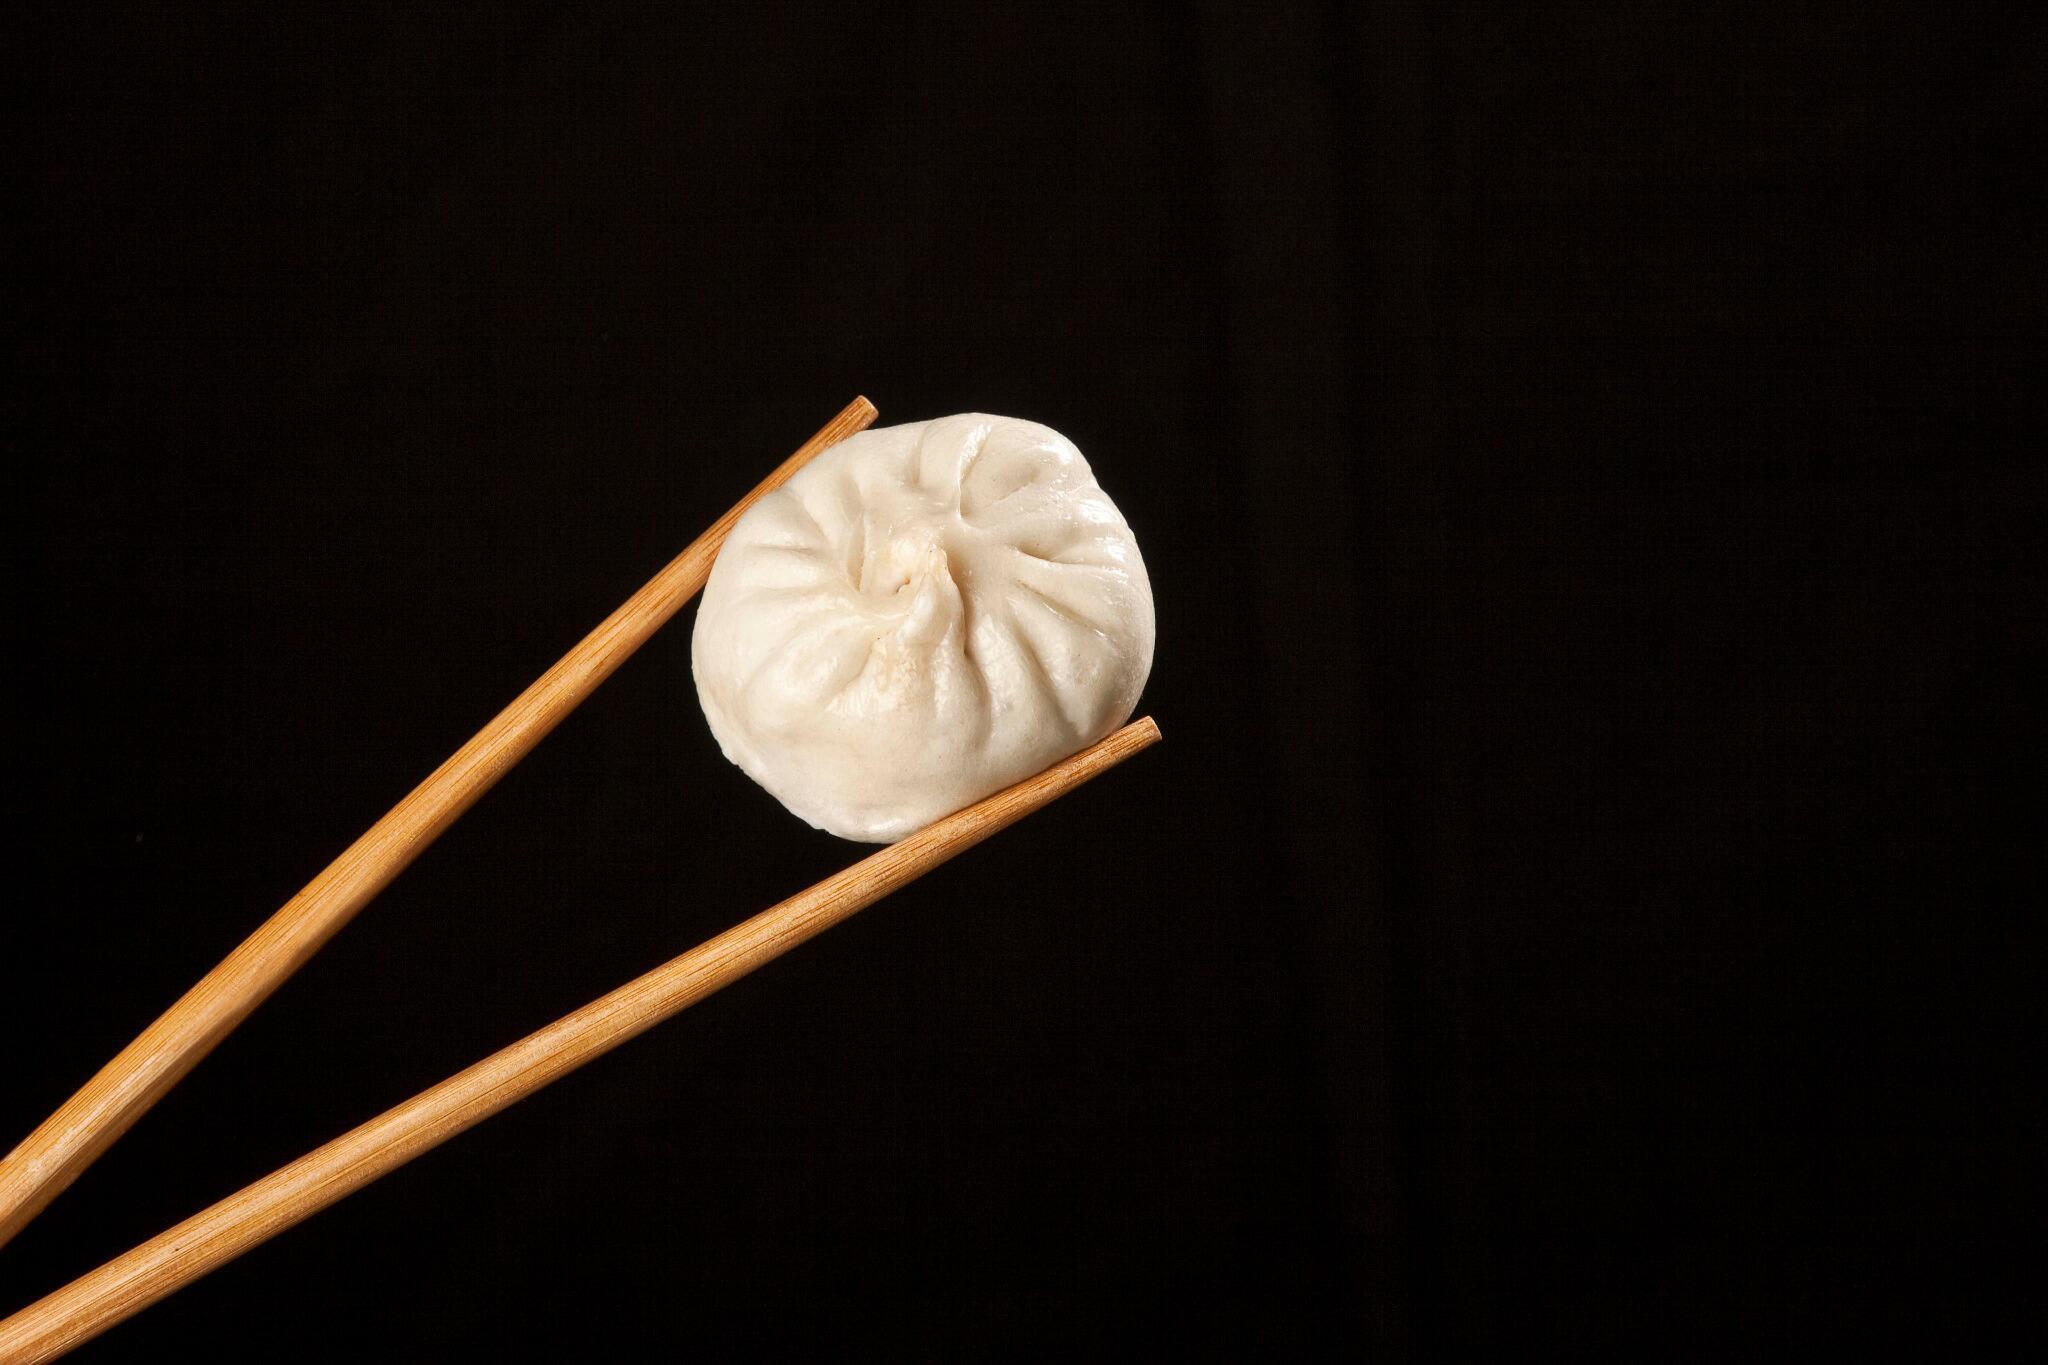 Las técnicas de cocción,tanto clásicas como modernas, son un patrimonio q el cocinero debe saber aprovechar al máximo http://t.co/9OJ0mO0g5m